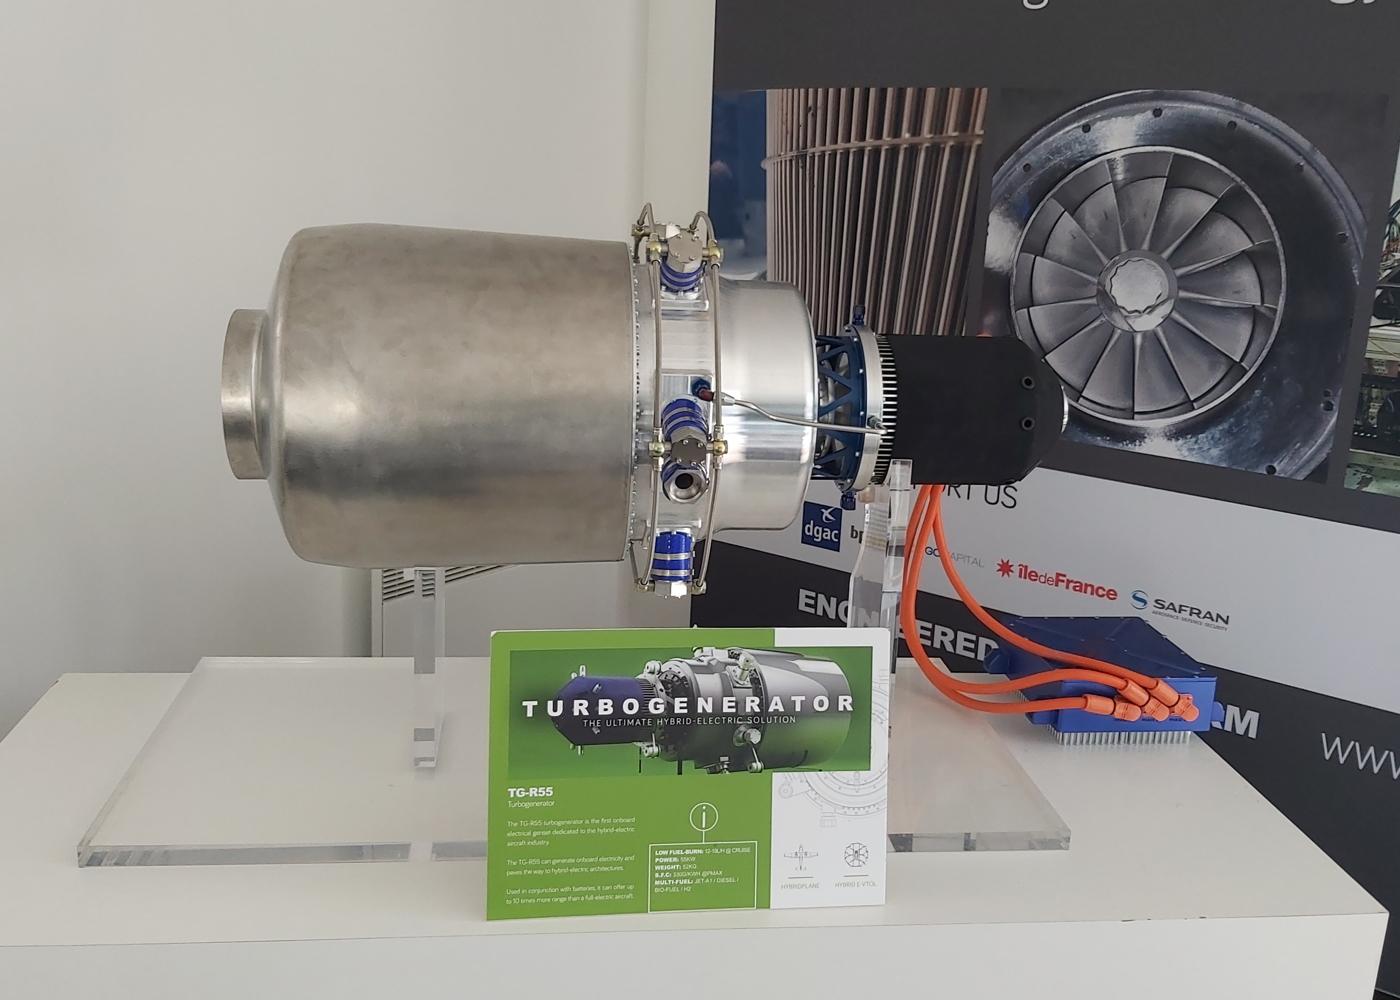 Turbotech TG-R55 turbogenerator